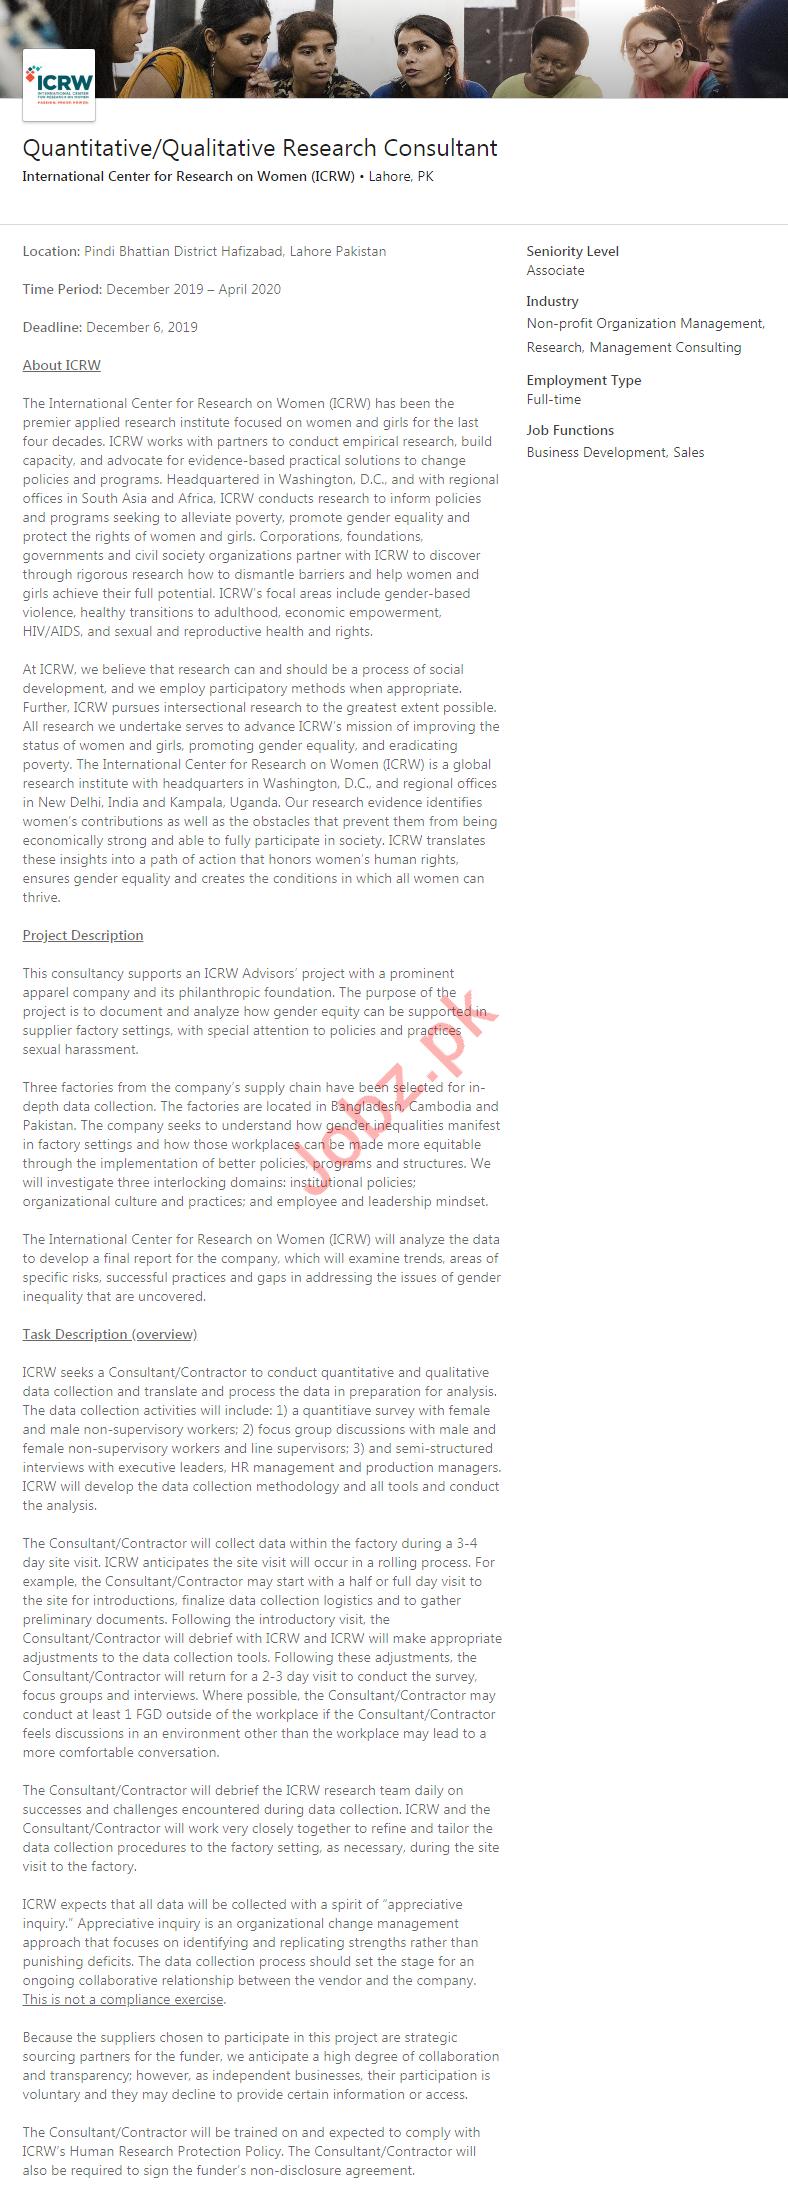 Quantitative & Qualitative Research Consultant Job 2020